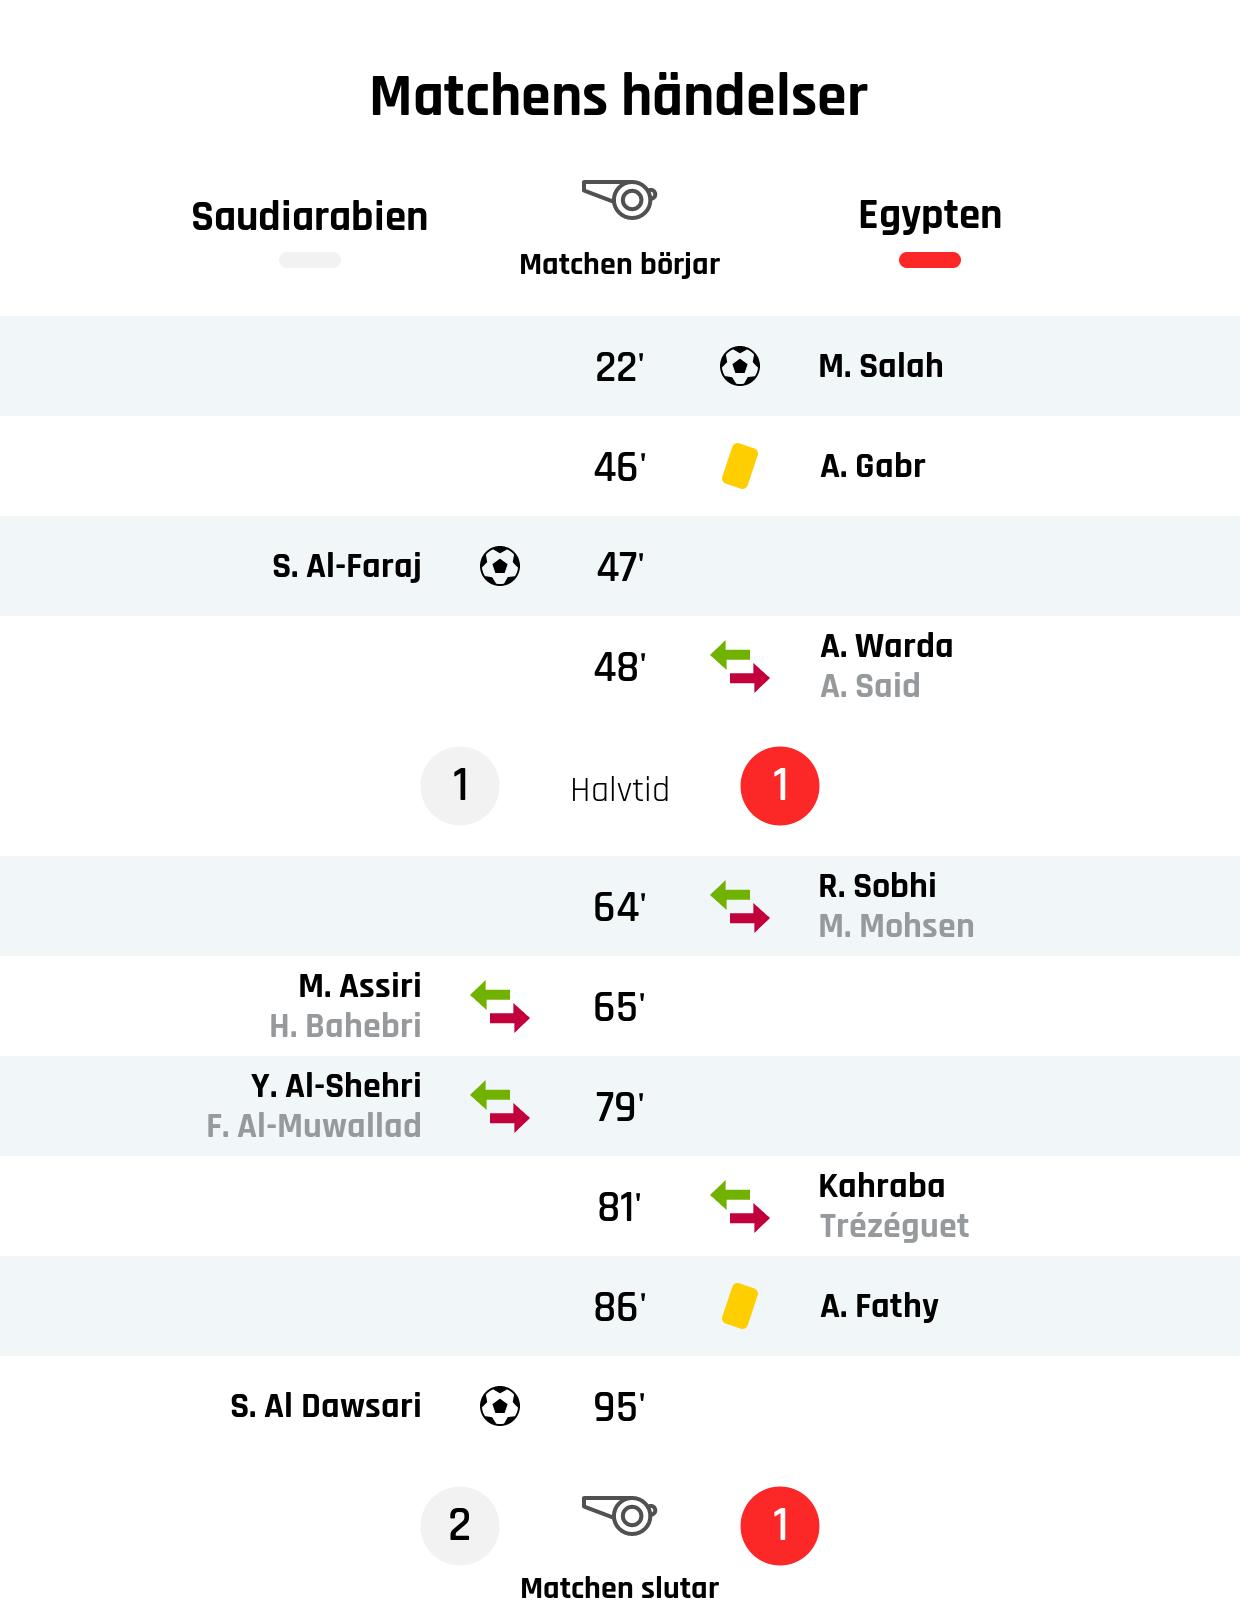 22' Mål Egypten: M. Salah<br />46' Gult kort: A. Gabr, Egypten<br />47' Mål Saudiarabien: S. Al-Faraj<br />48' Egyptens byte: A. Warda in, A. Said ut<br />Resultat i halvtid: Saudiarabien 1, Egypten 1<br />64' Egyptens byte: R. Sobhi in, M. Mohsen ut<br />65' Saudiarabiens byte: M. Assiri in, H. Bahebri ut<br />79' Saudiarabiens byte: Y. Al-Shehri in, F. Al-Muwallad ut<br />81' Egyptens byte: Kahraba in, Trézéguet ut<br />86' Gult kort: A. Fathy, Egypten<br />95' Mål Saudiarabien: S. Al Dawsari<br />Slutresultat: Saudiarabien 2, Egypten 1